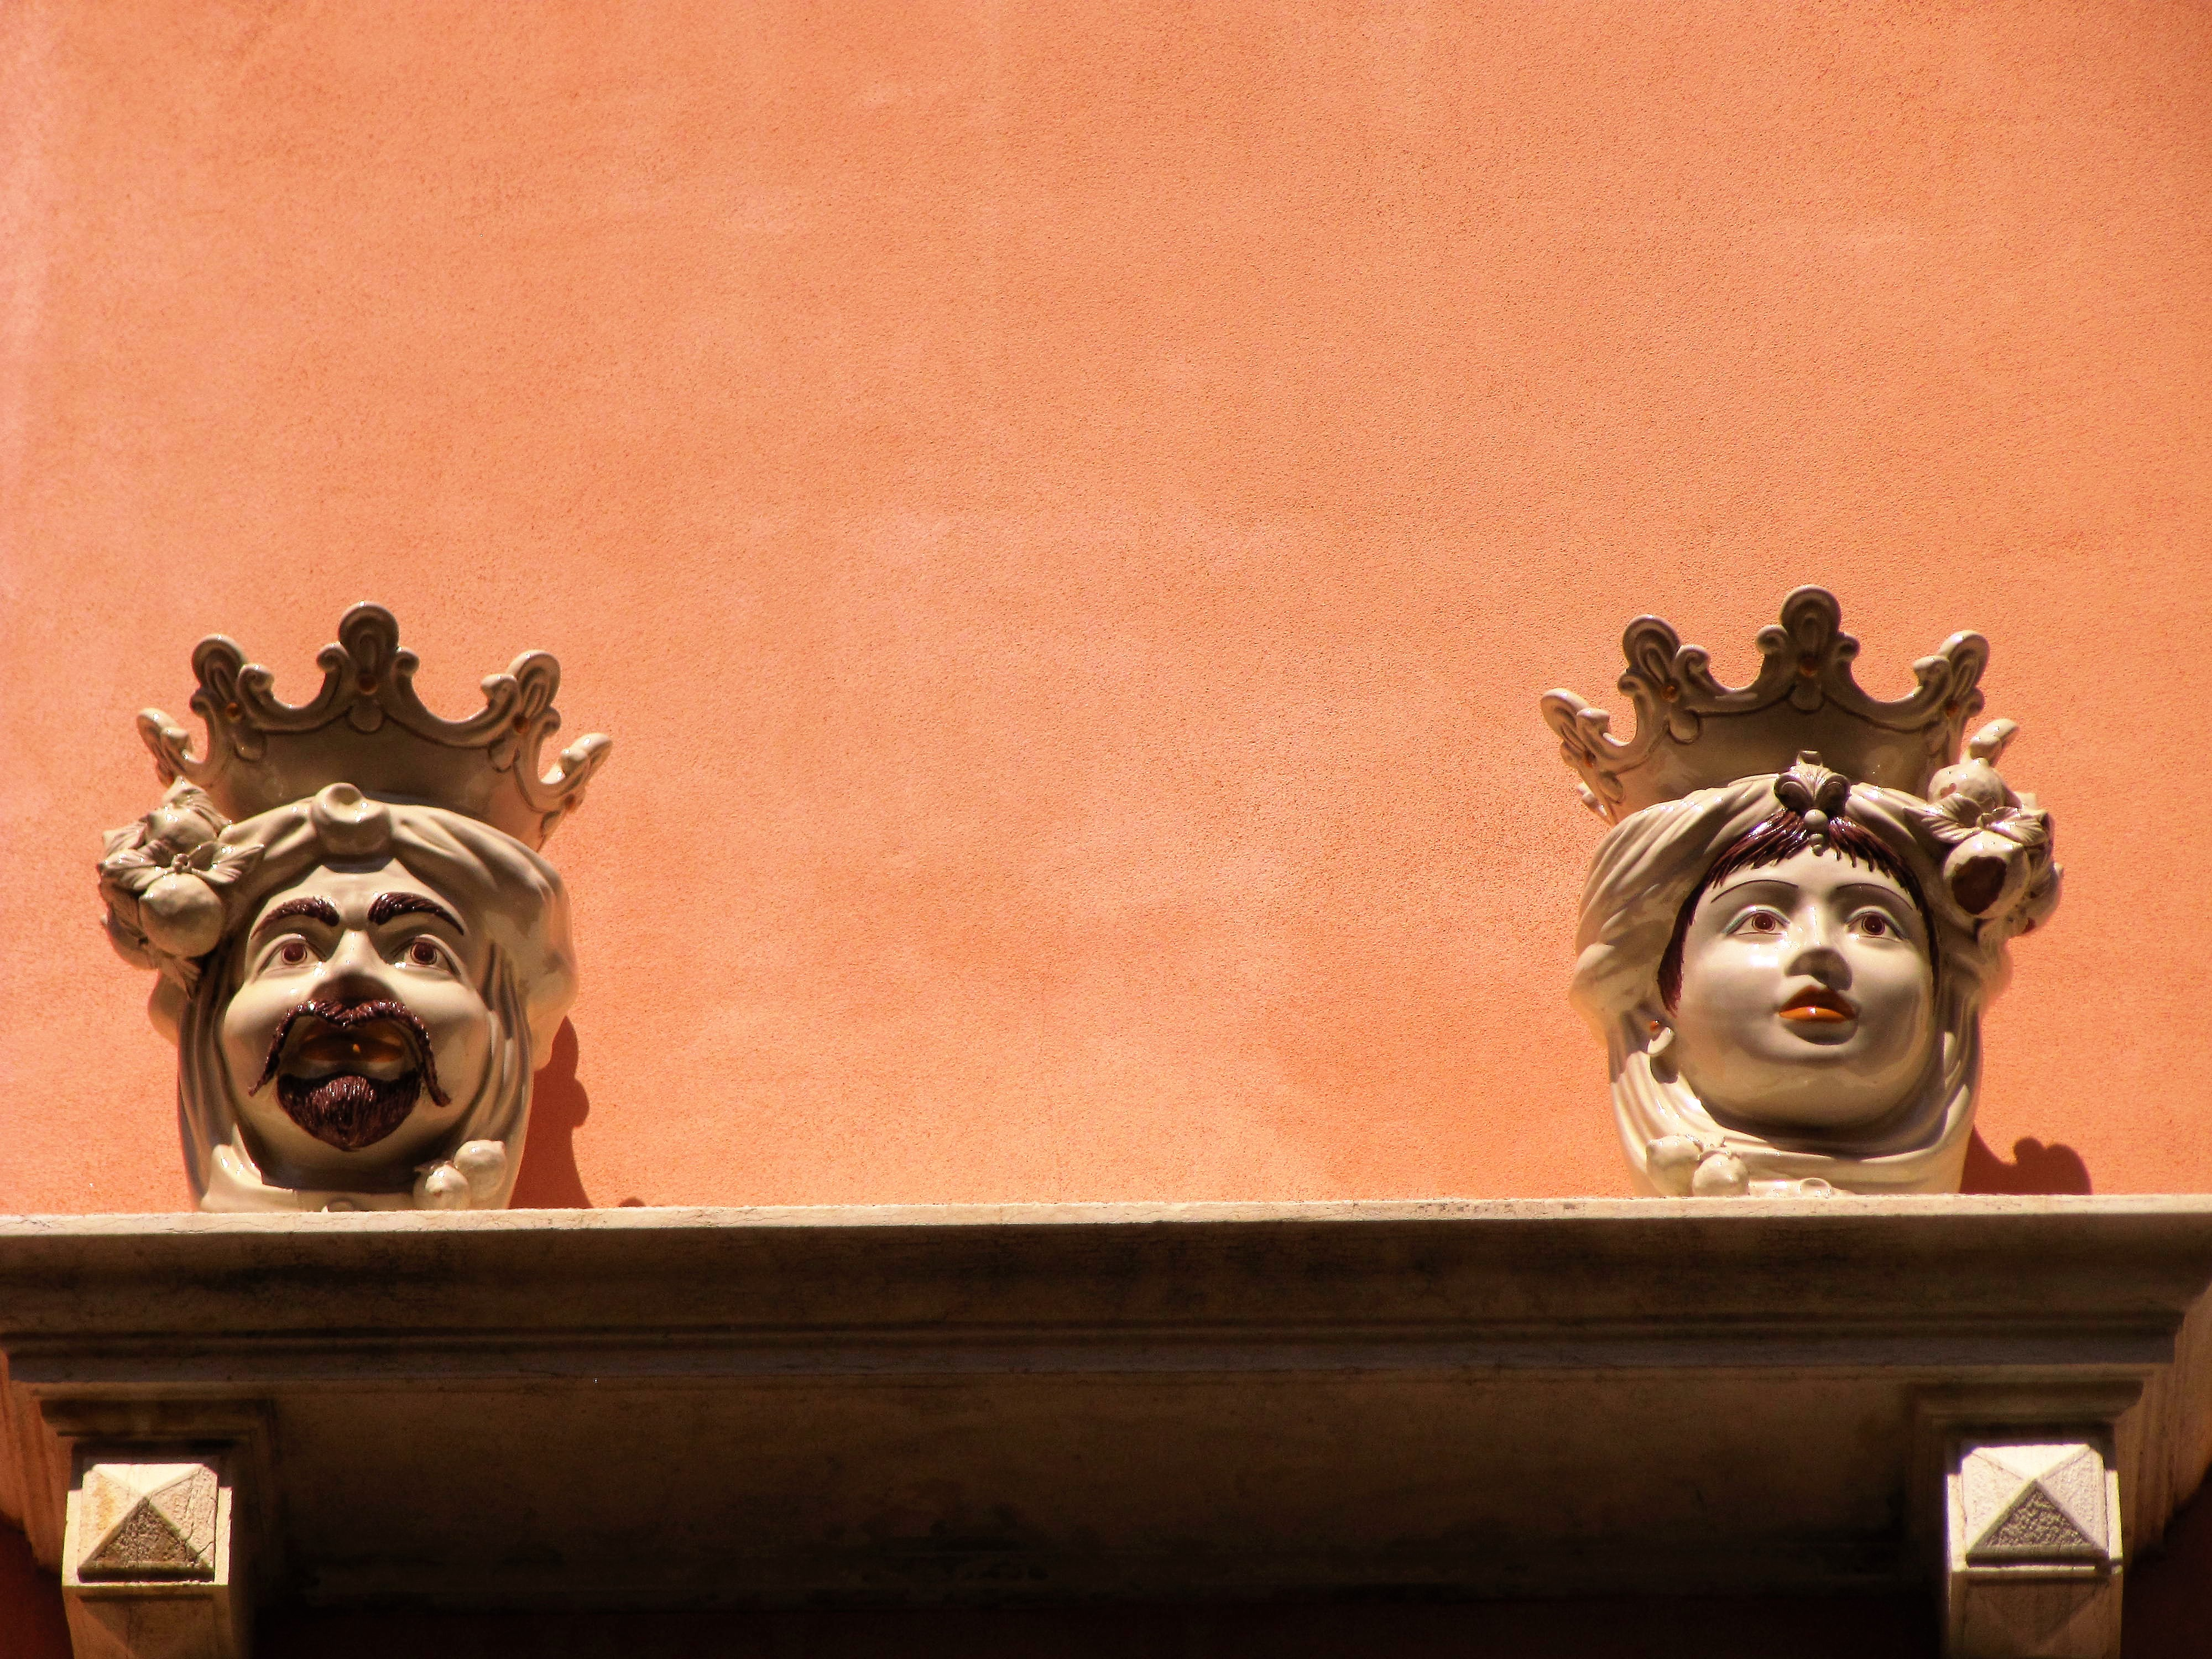 86974cdf497d52 Marinai, mercanti, seduttori tra Sicilia e Tunisia | Dialoghi ...